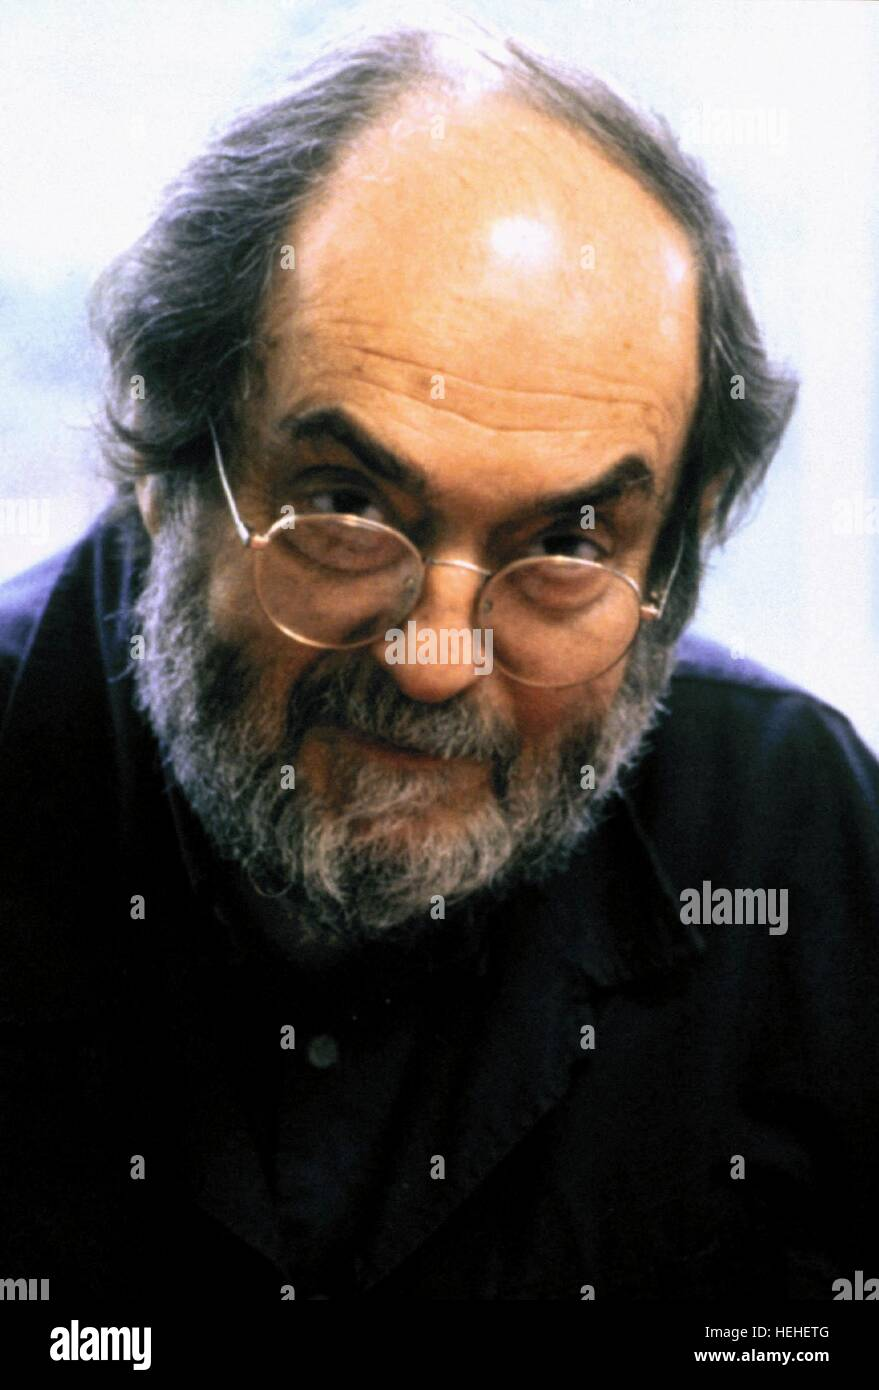 STANLEY KUBRICK DIRECTOR (1999) - Stock Image